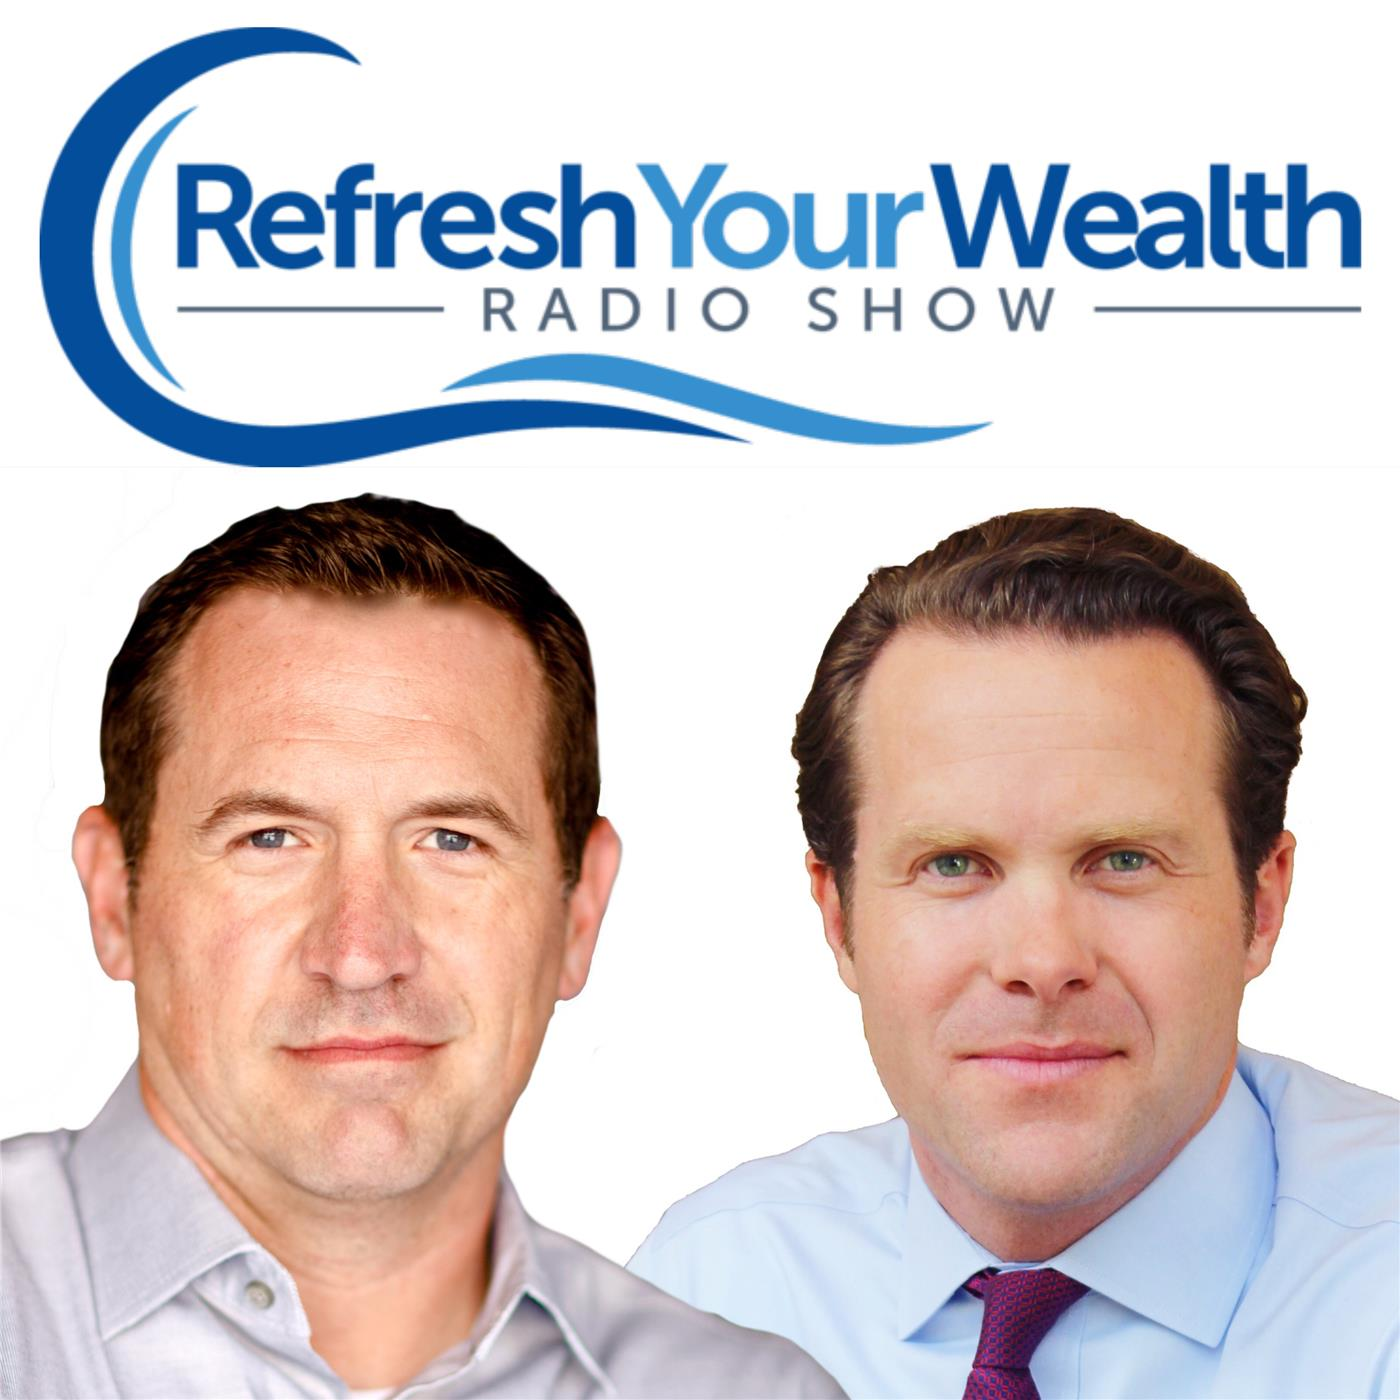 Refresh Your Wealth Radio Show